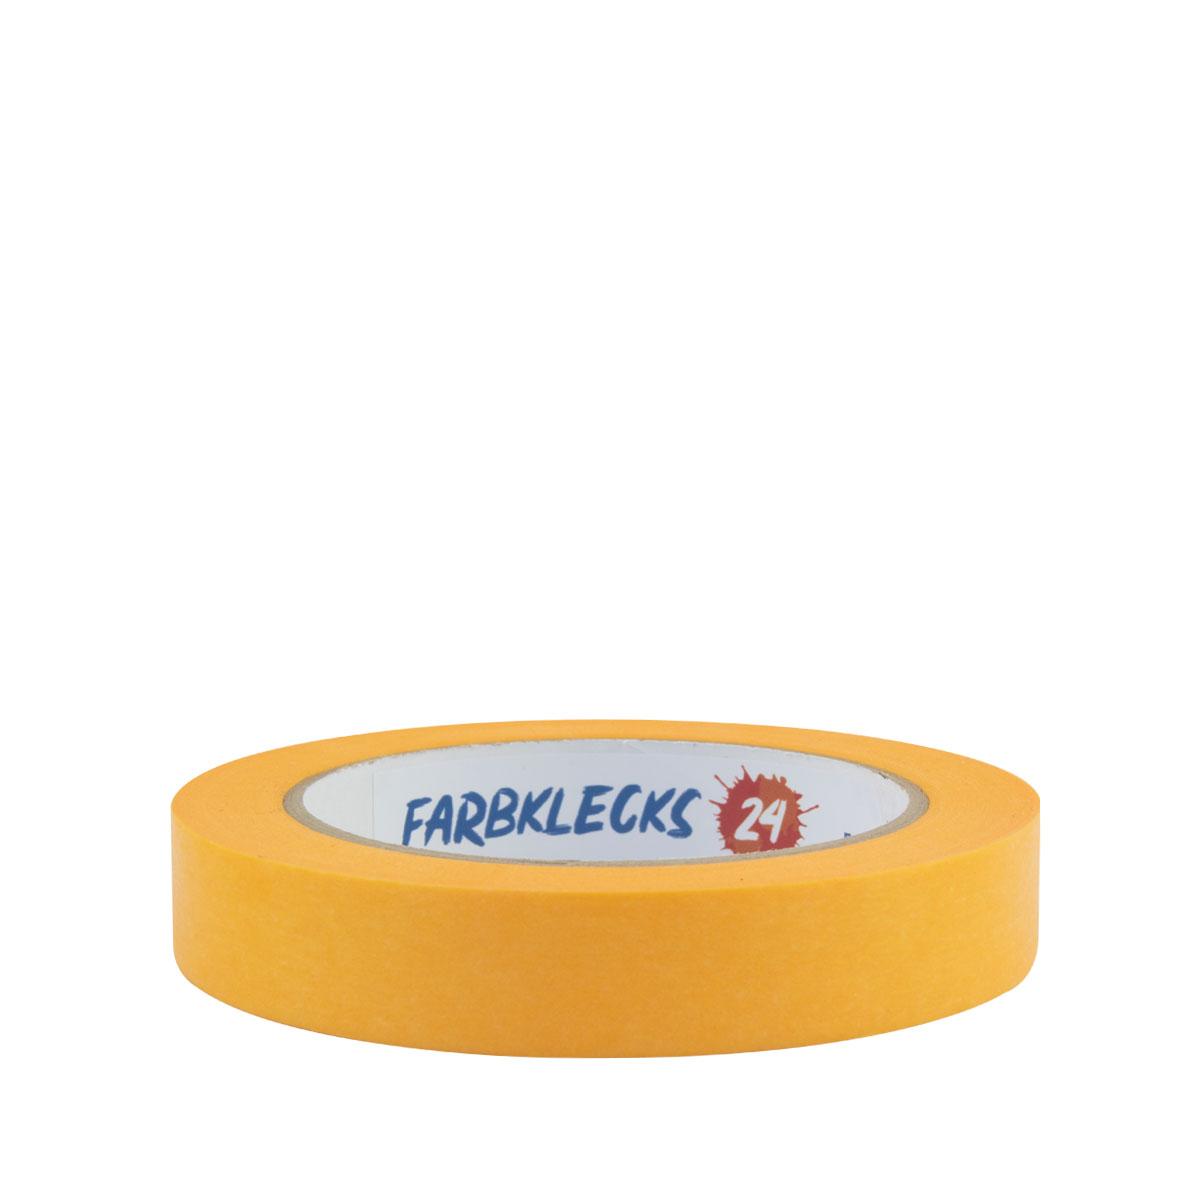 Farbklecks24 Klebeband Gold, Goldband 19mm